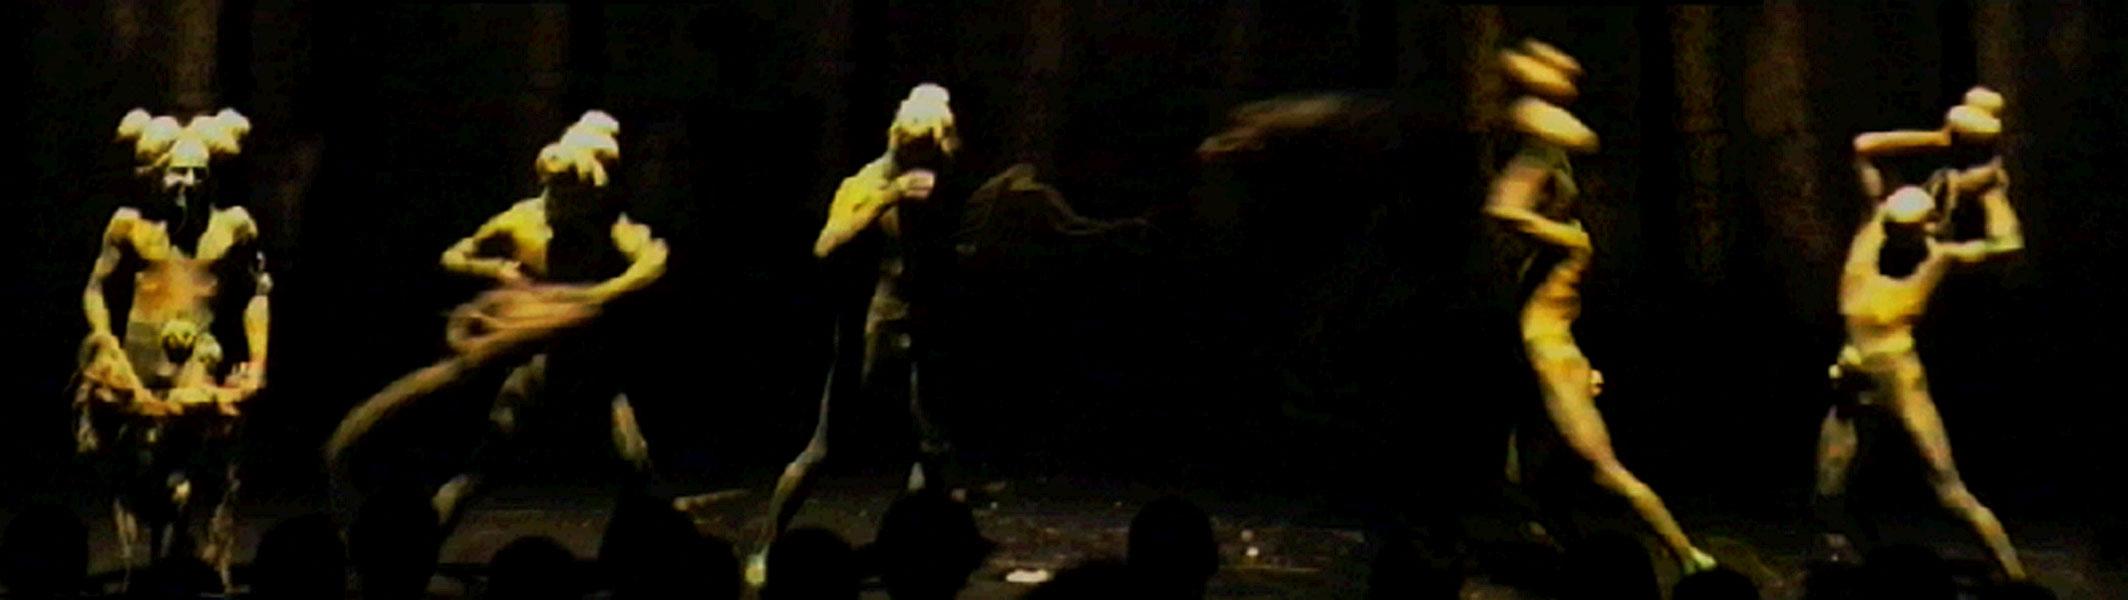 1996-09-04-SF-omfintlig-tv38-throw